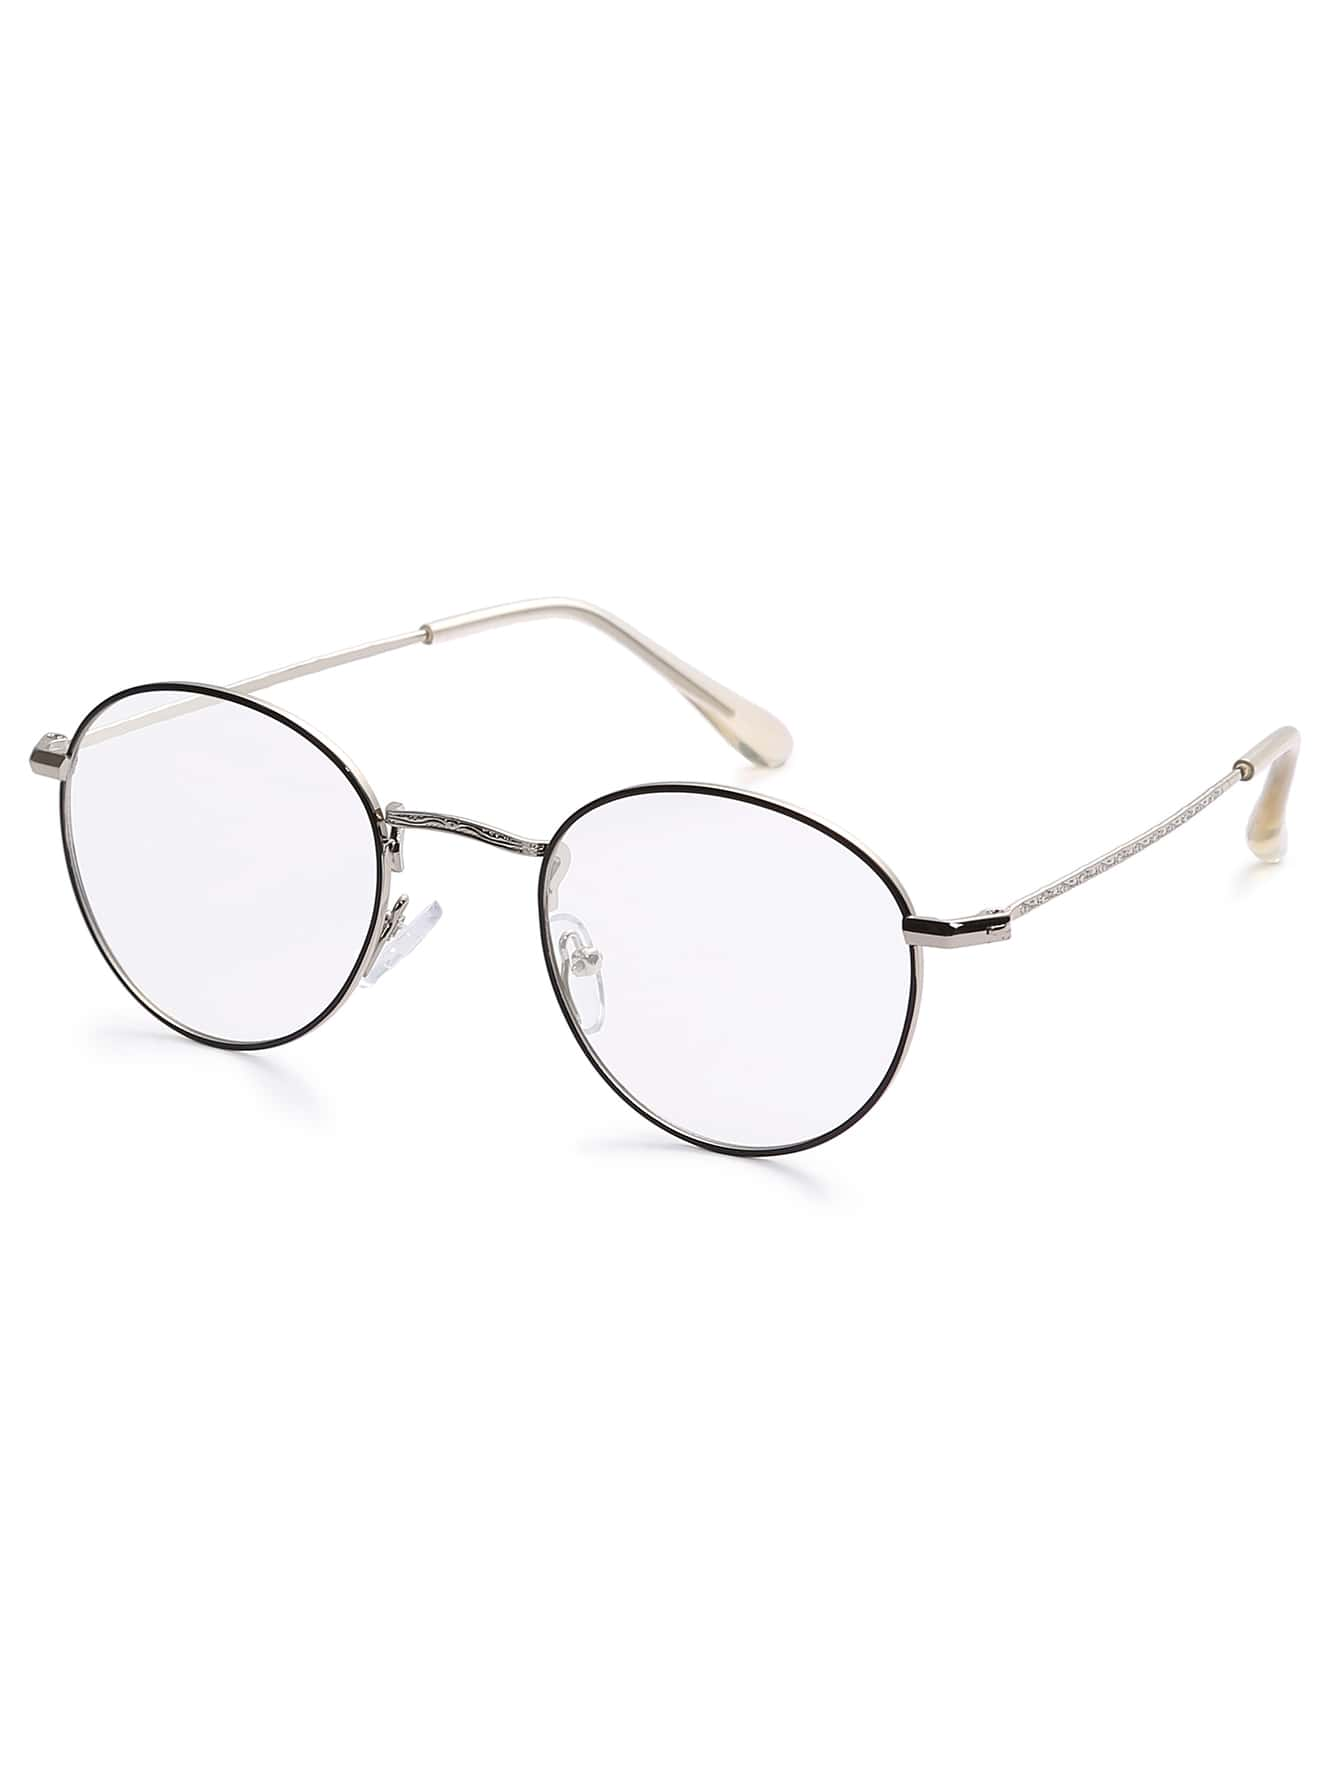 7044c6113d56 Silver Metal Frame Clear Lens Glasses -SheIn(Sheinside)